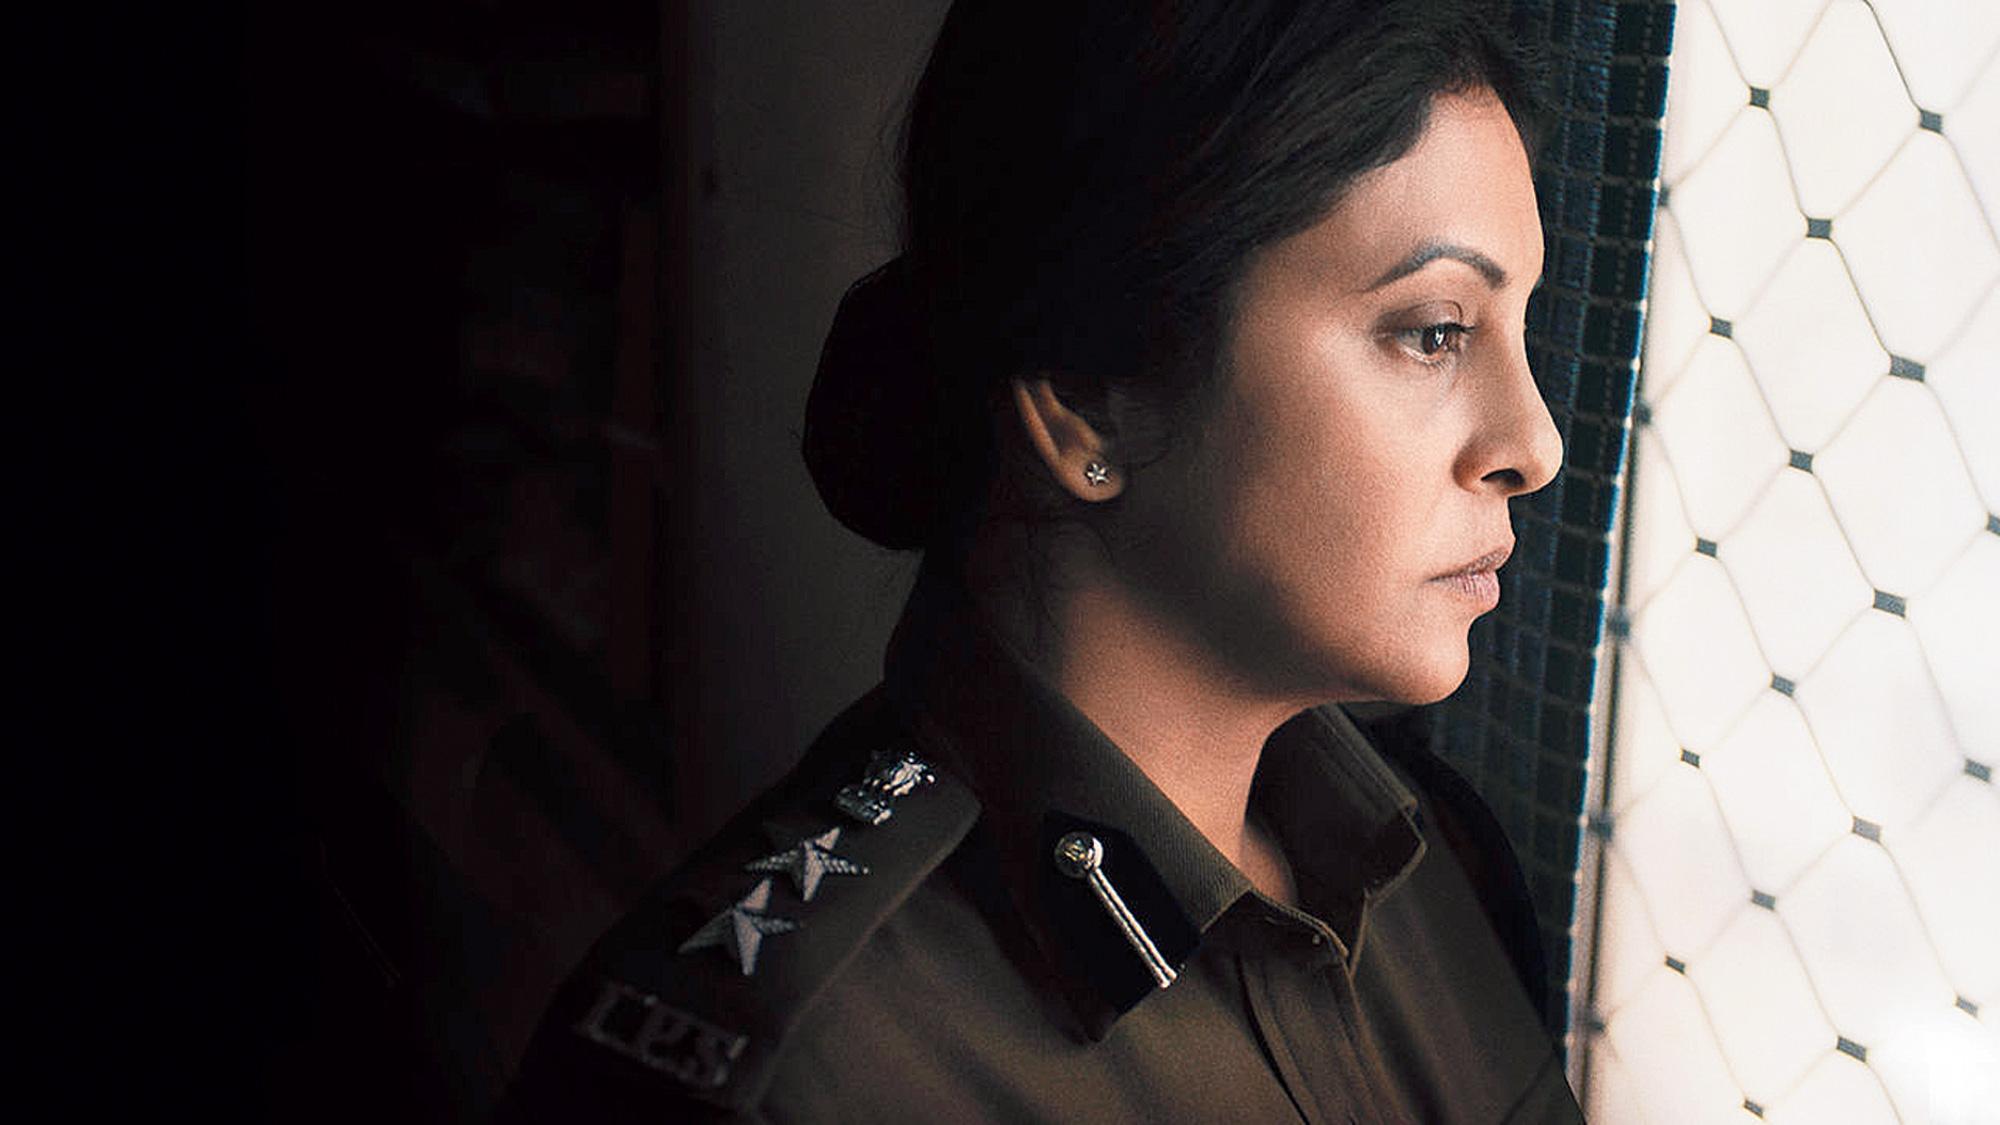 Shefali Shah as Vartika  Chaturvedi in Delhi Crime, now streaming on Netflix.